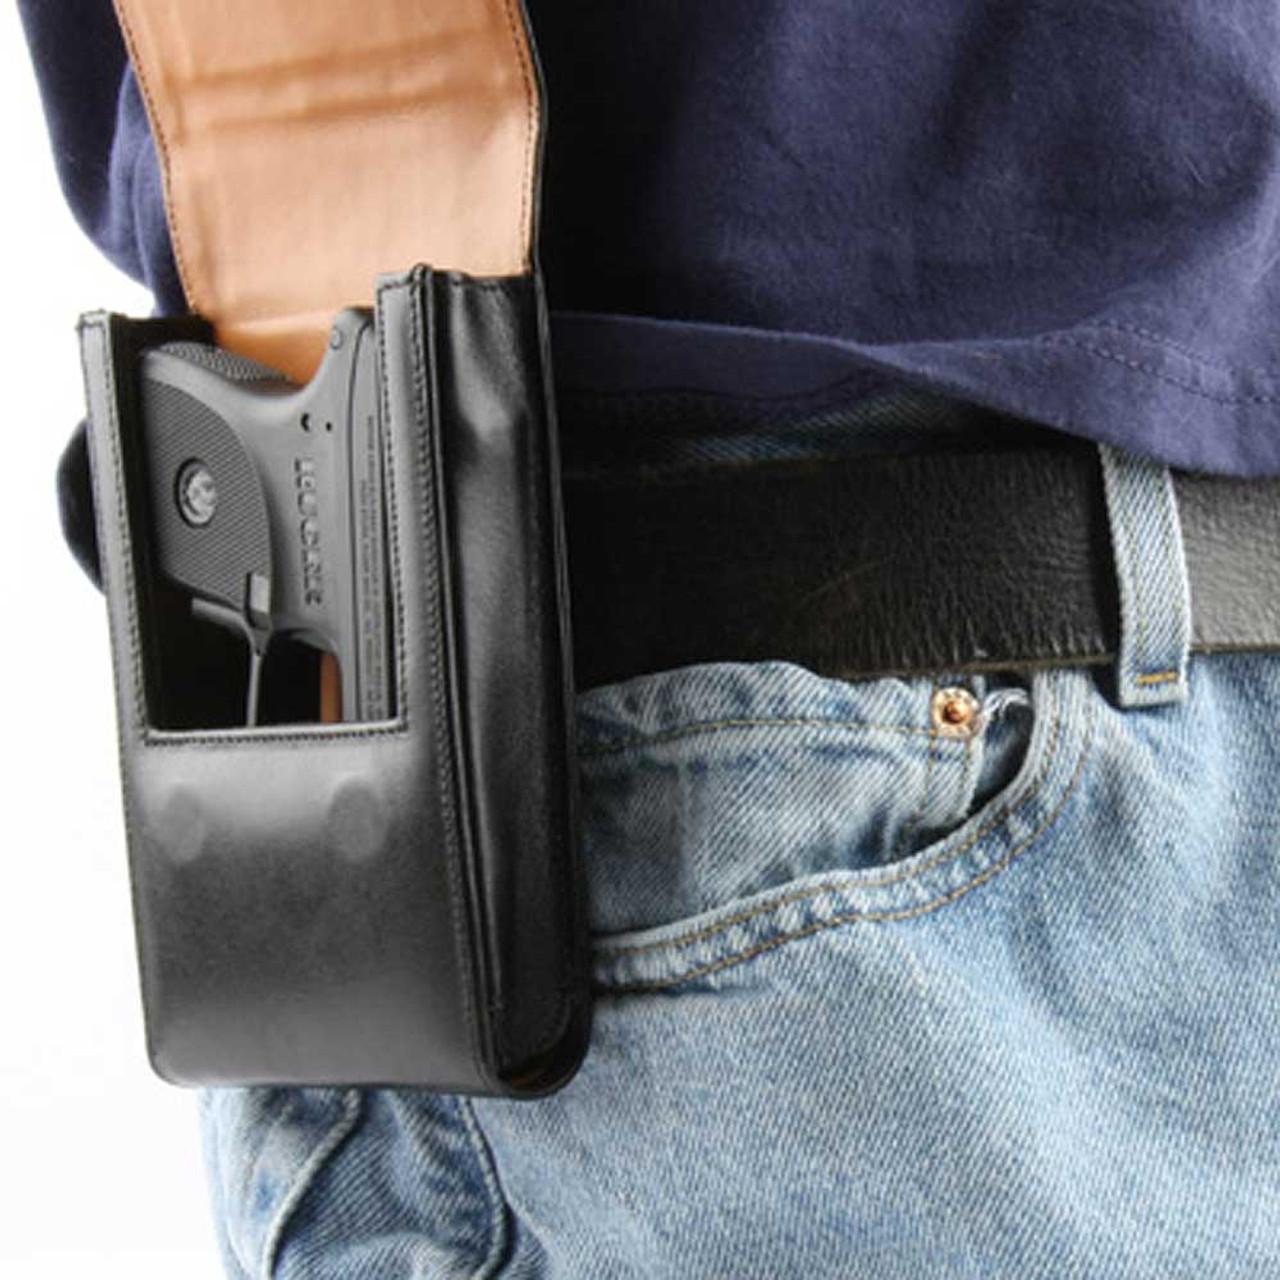 Keltec PF9 Concealed Carry Holster (Belt Loop)